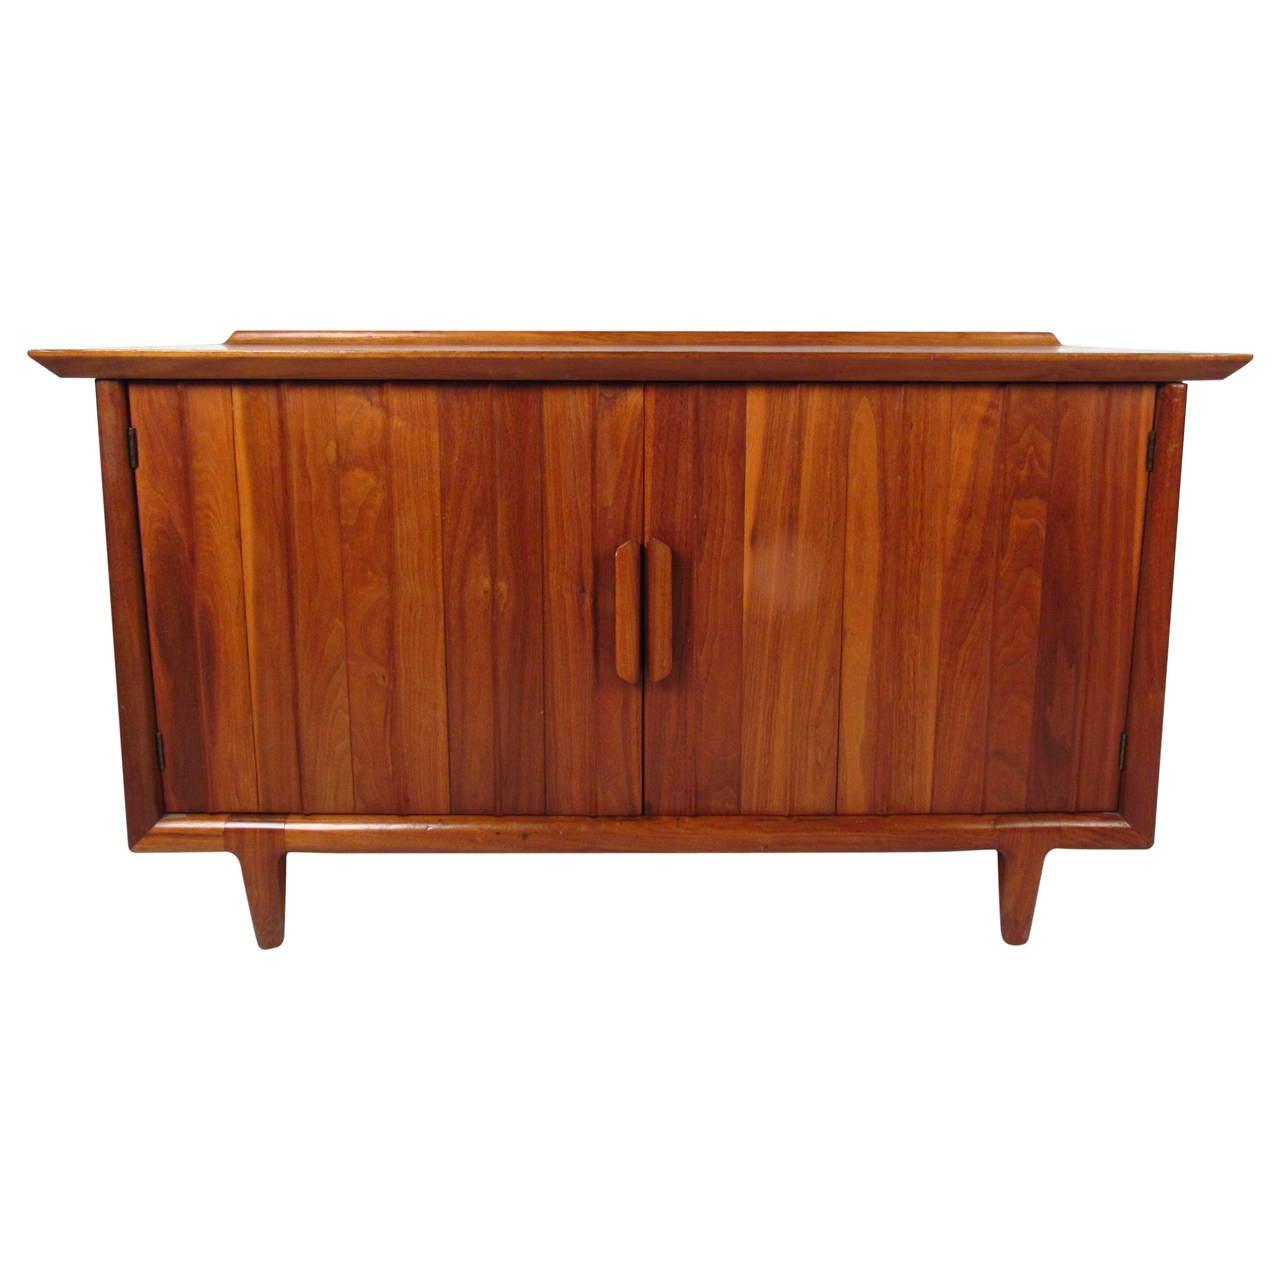 Mid Century Modern Raised Edge American Walnut Cabinet By Heritage Henredon For At 1stdibs